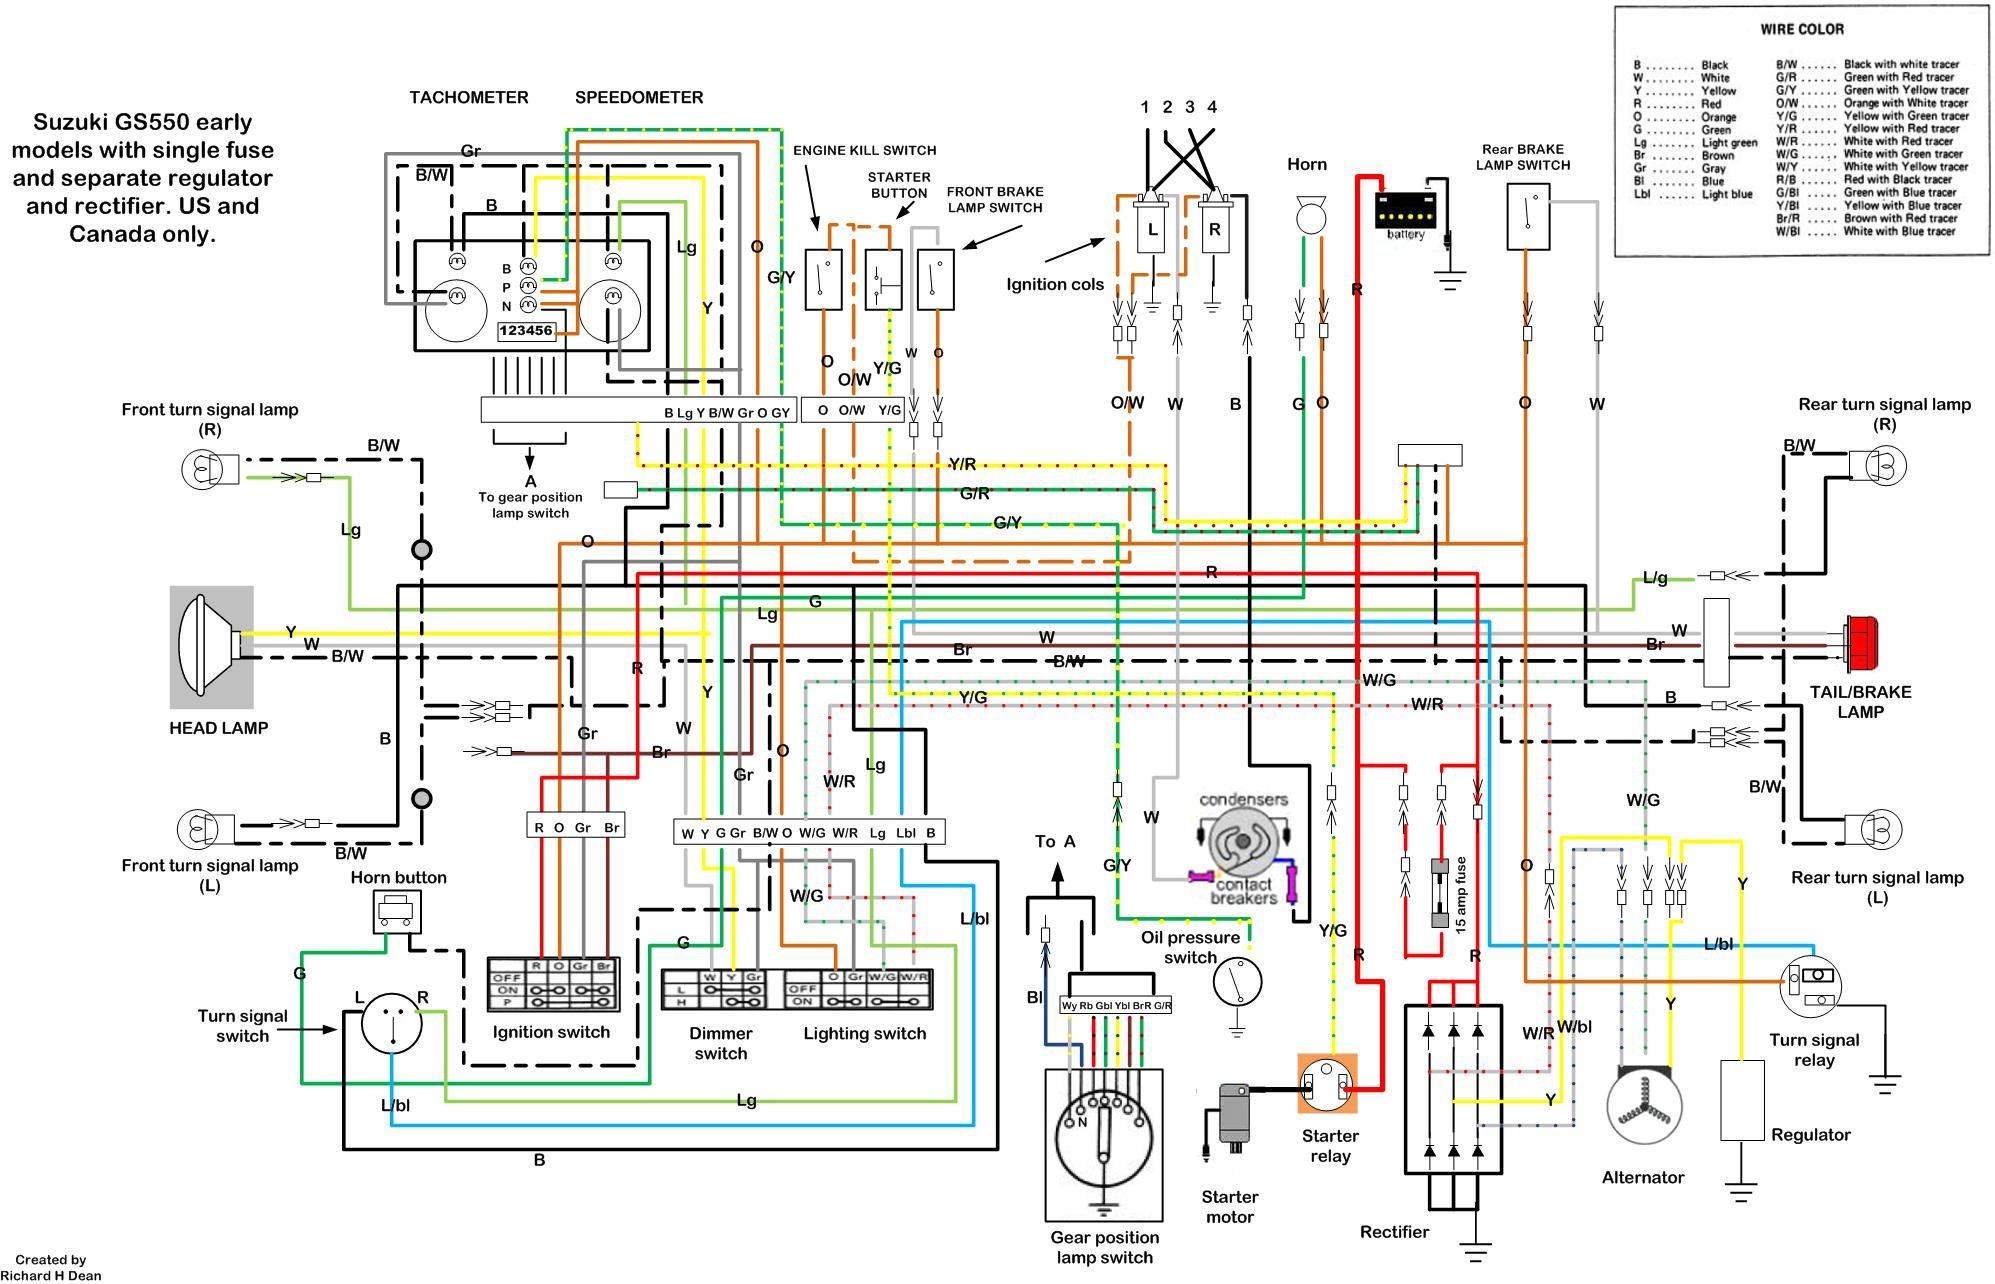 hight resolution of 2004 suzuki xl7 fuse box diagram